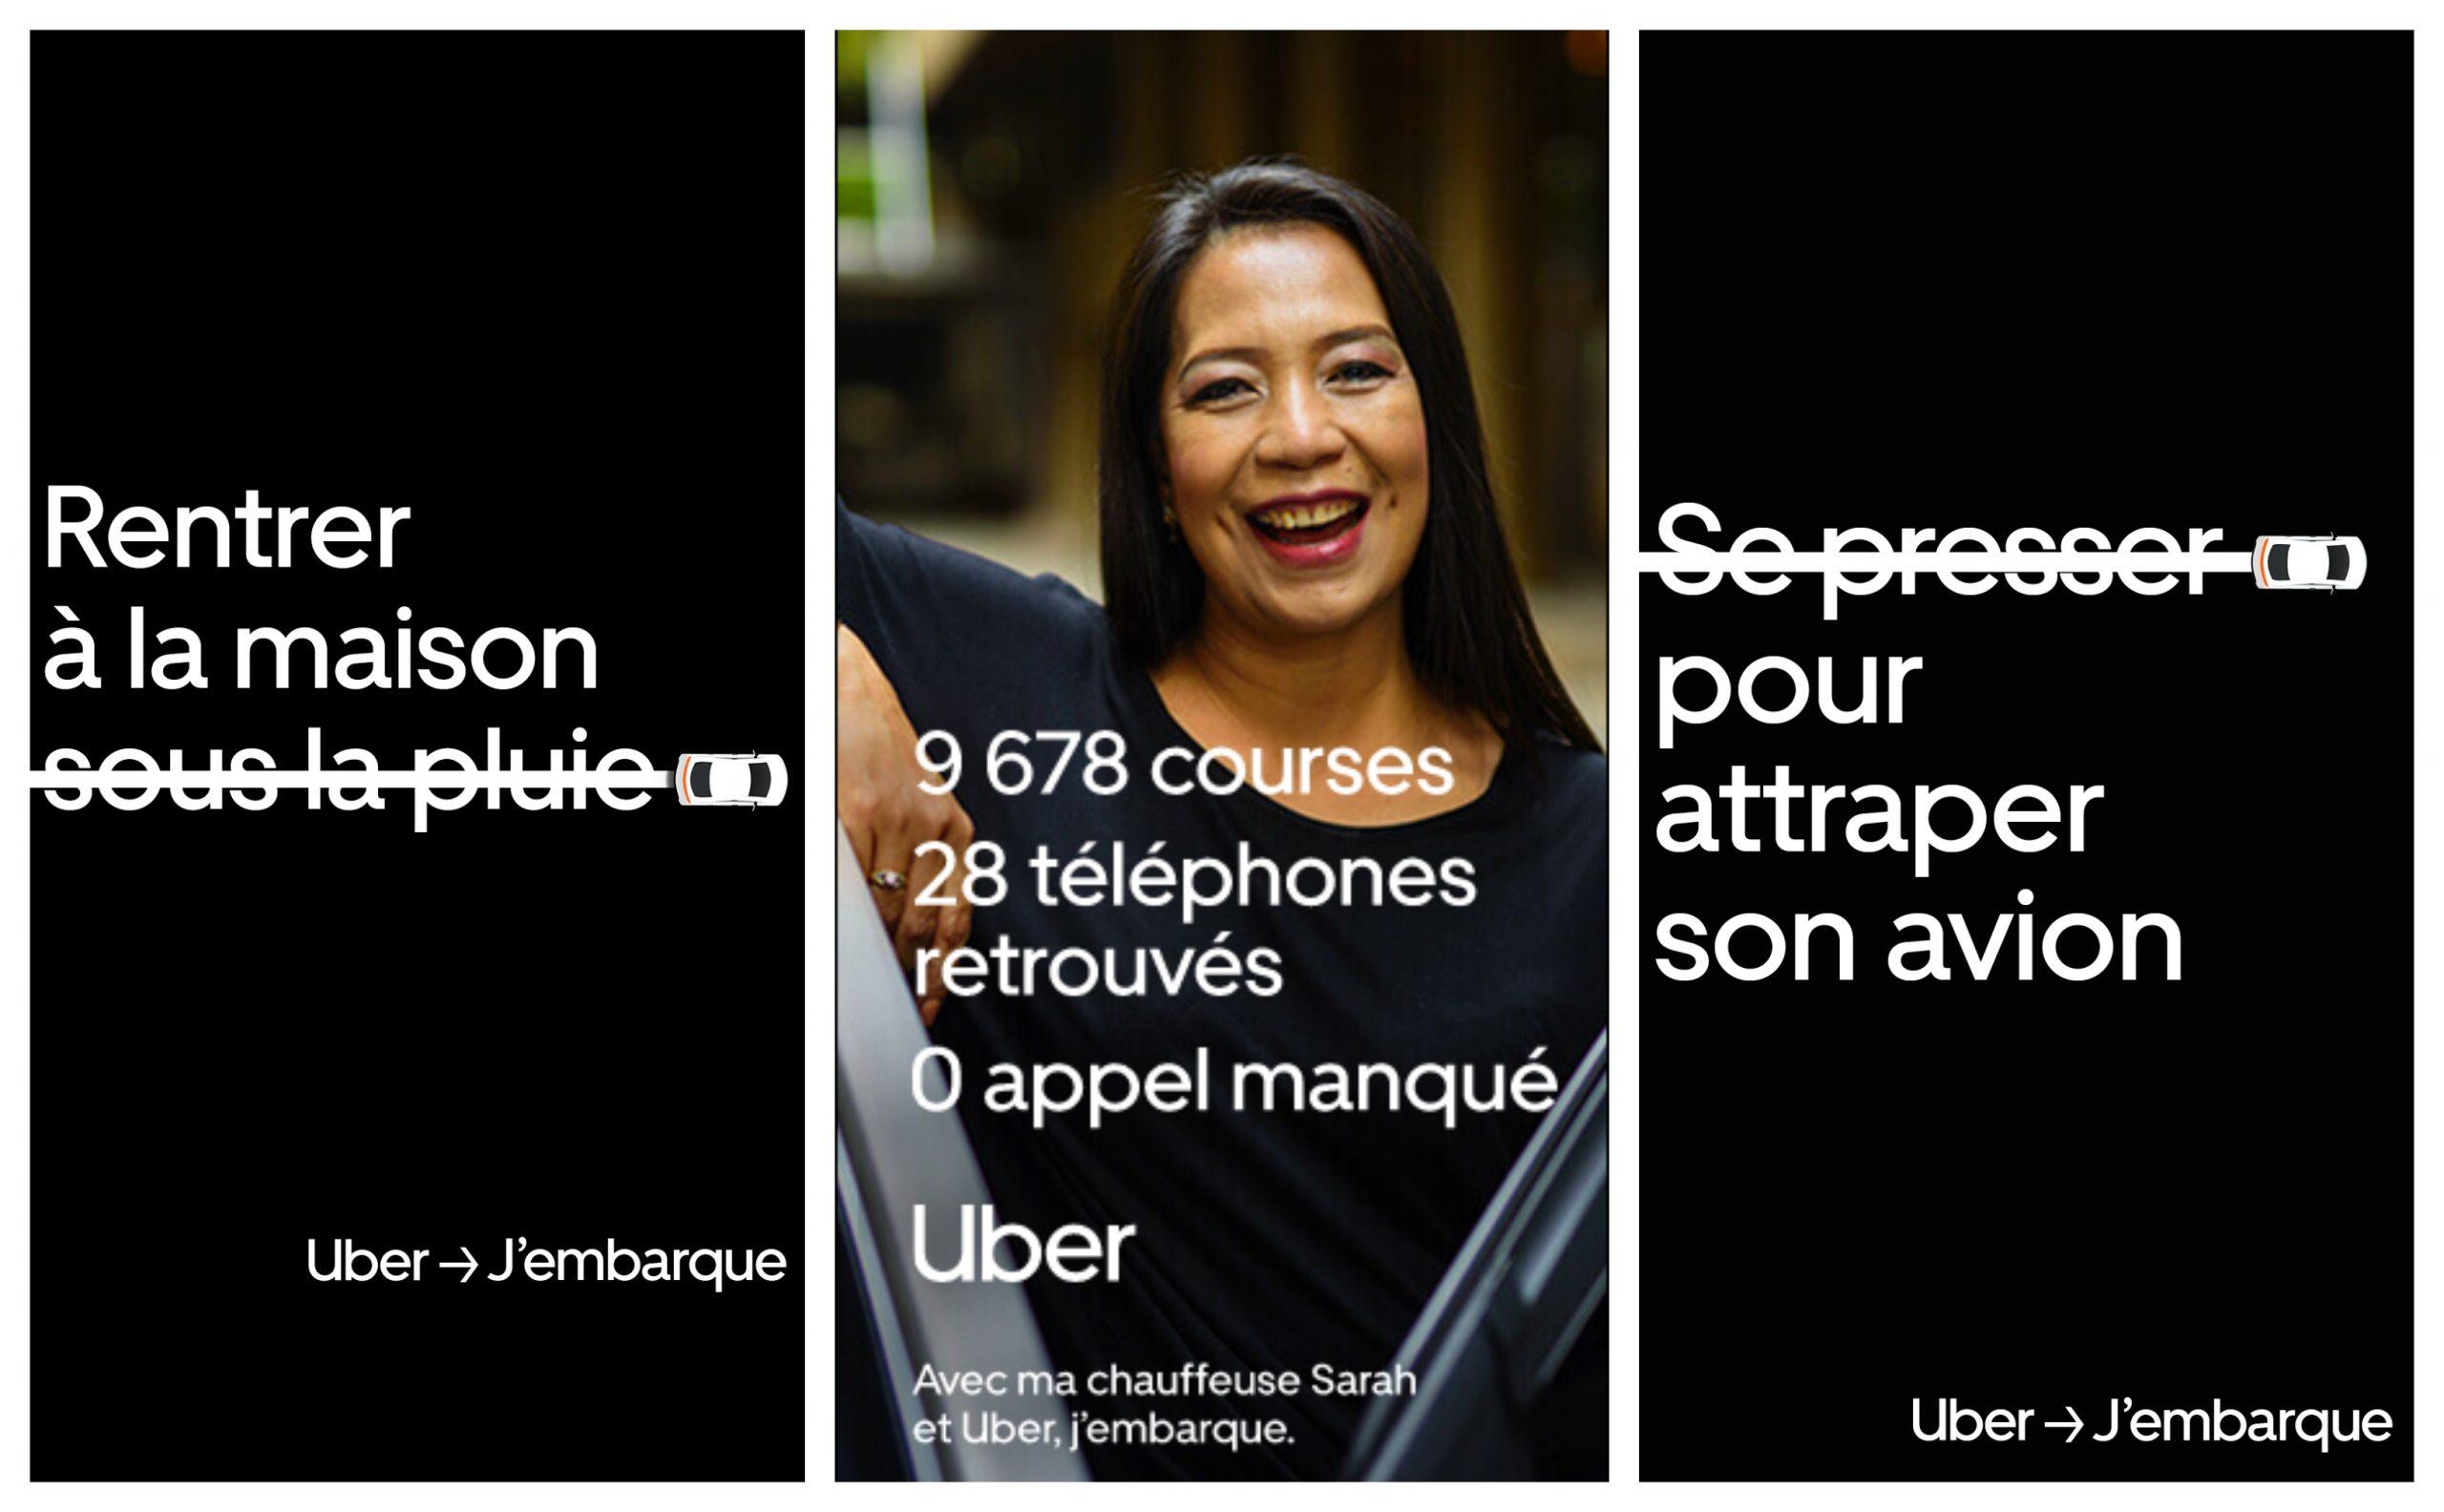 Uber Québec